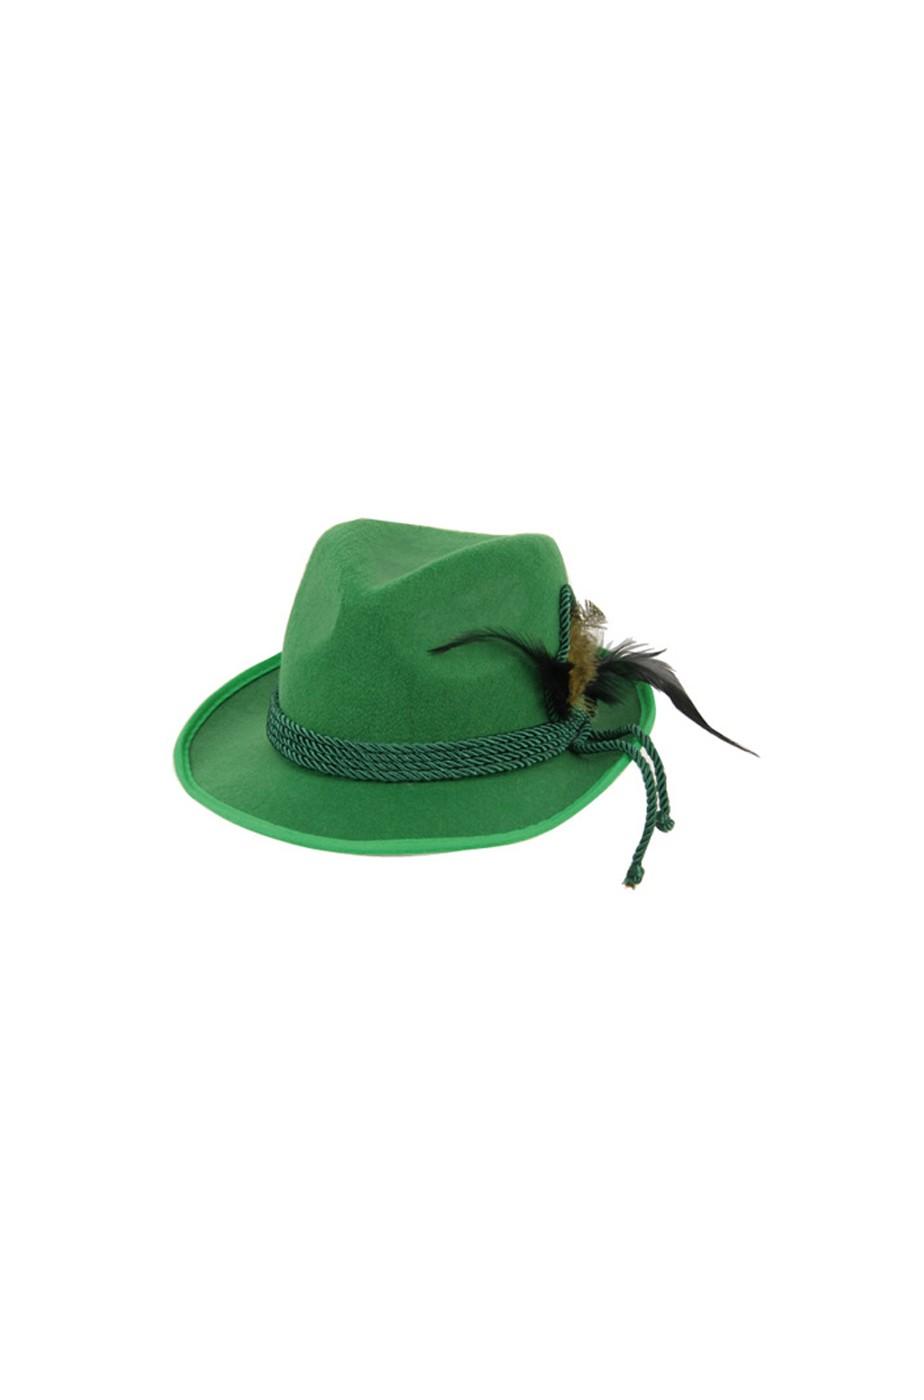 Adulti Oktoberfest Tedesco Cappello Di Feltro Verde Costume